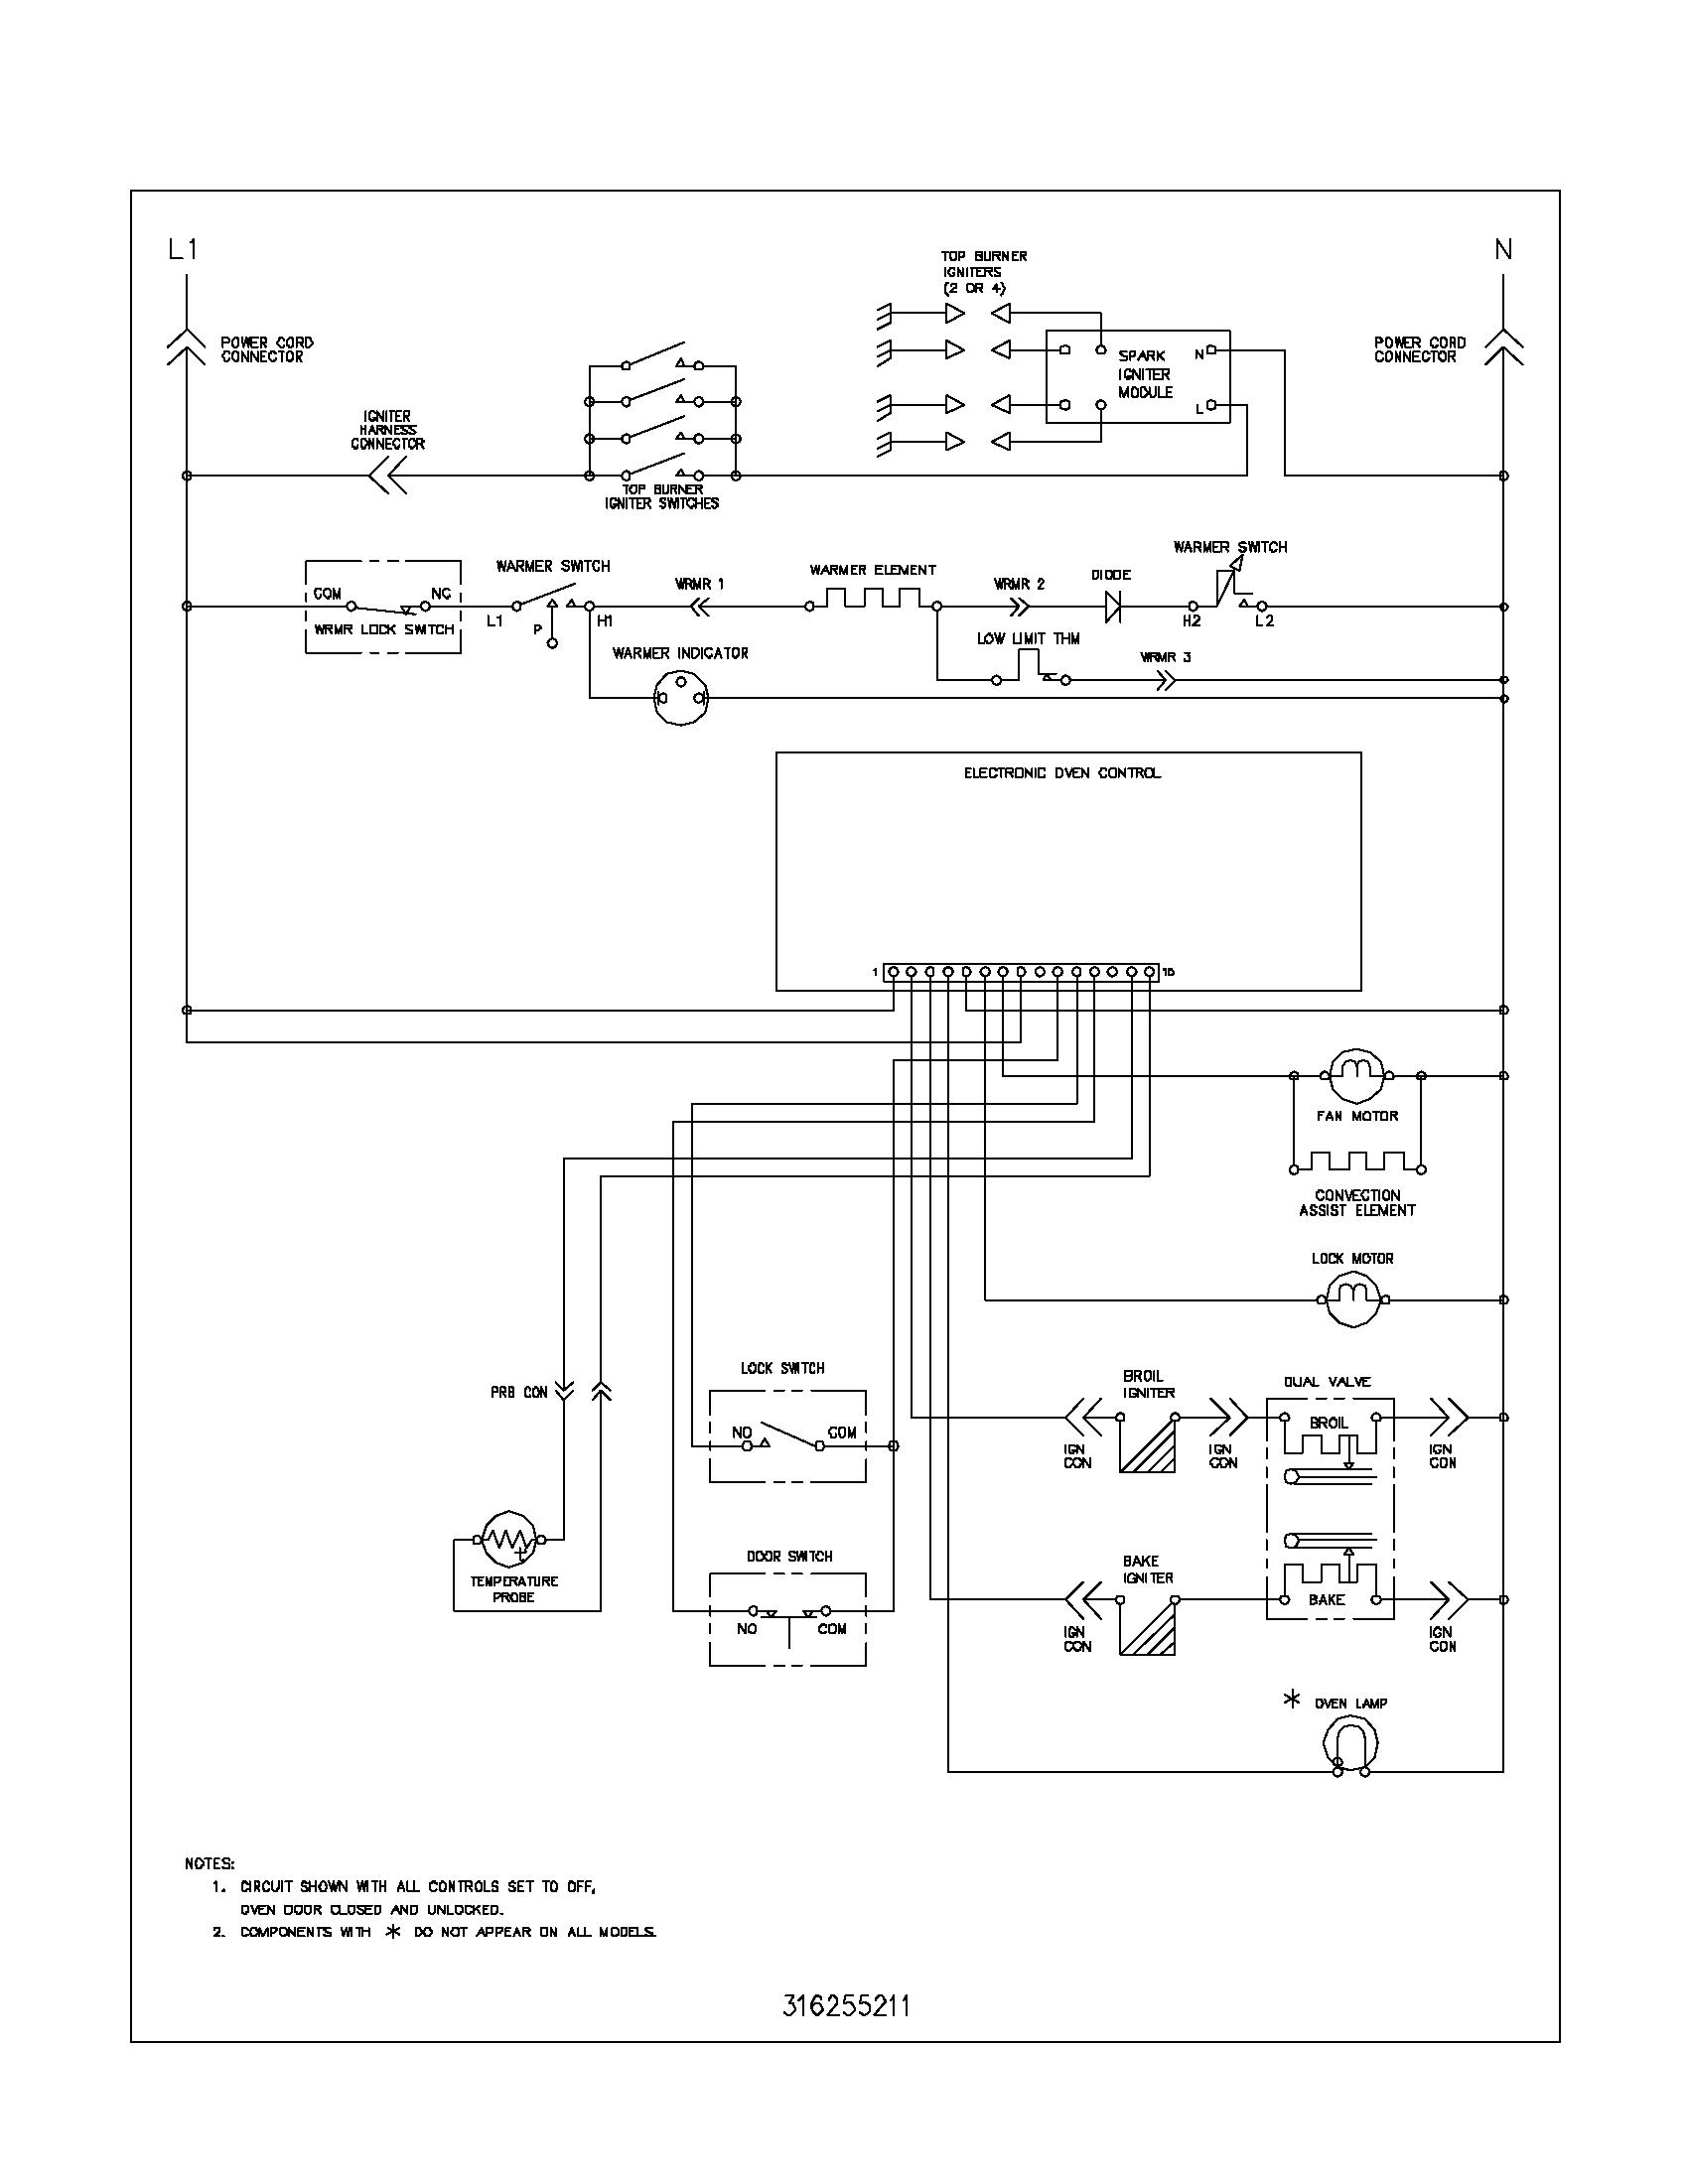 XC_4291] Plgf389Ccb Gas Range Wiring Diagram Parts Diagram Download DiagramOxyt Tomy Itive Kumb Sequ Phae Mohammedshrine Librar Wiring 101